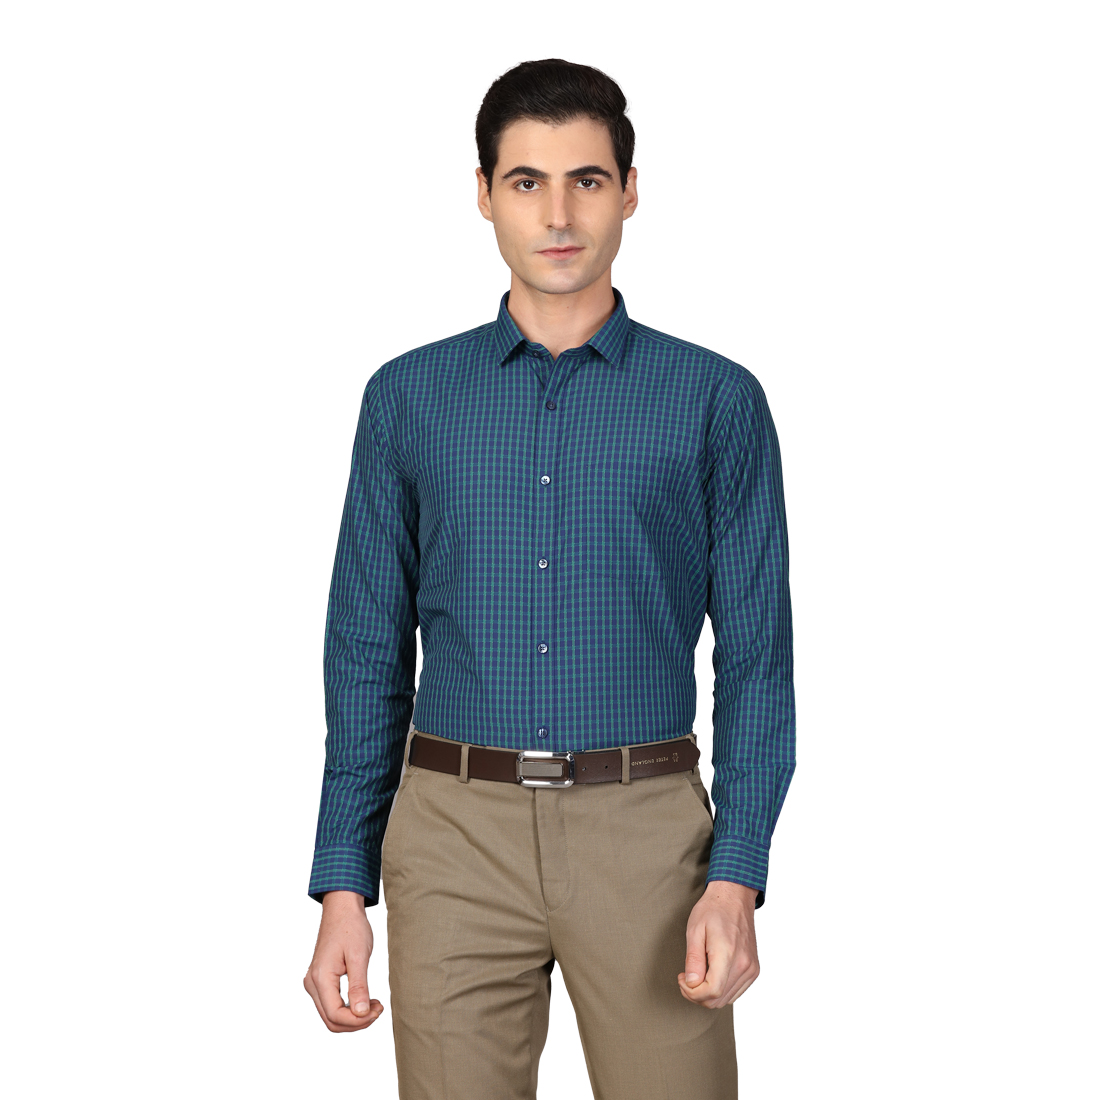 Next Look | Next Look Dark Green Shirt